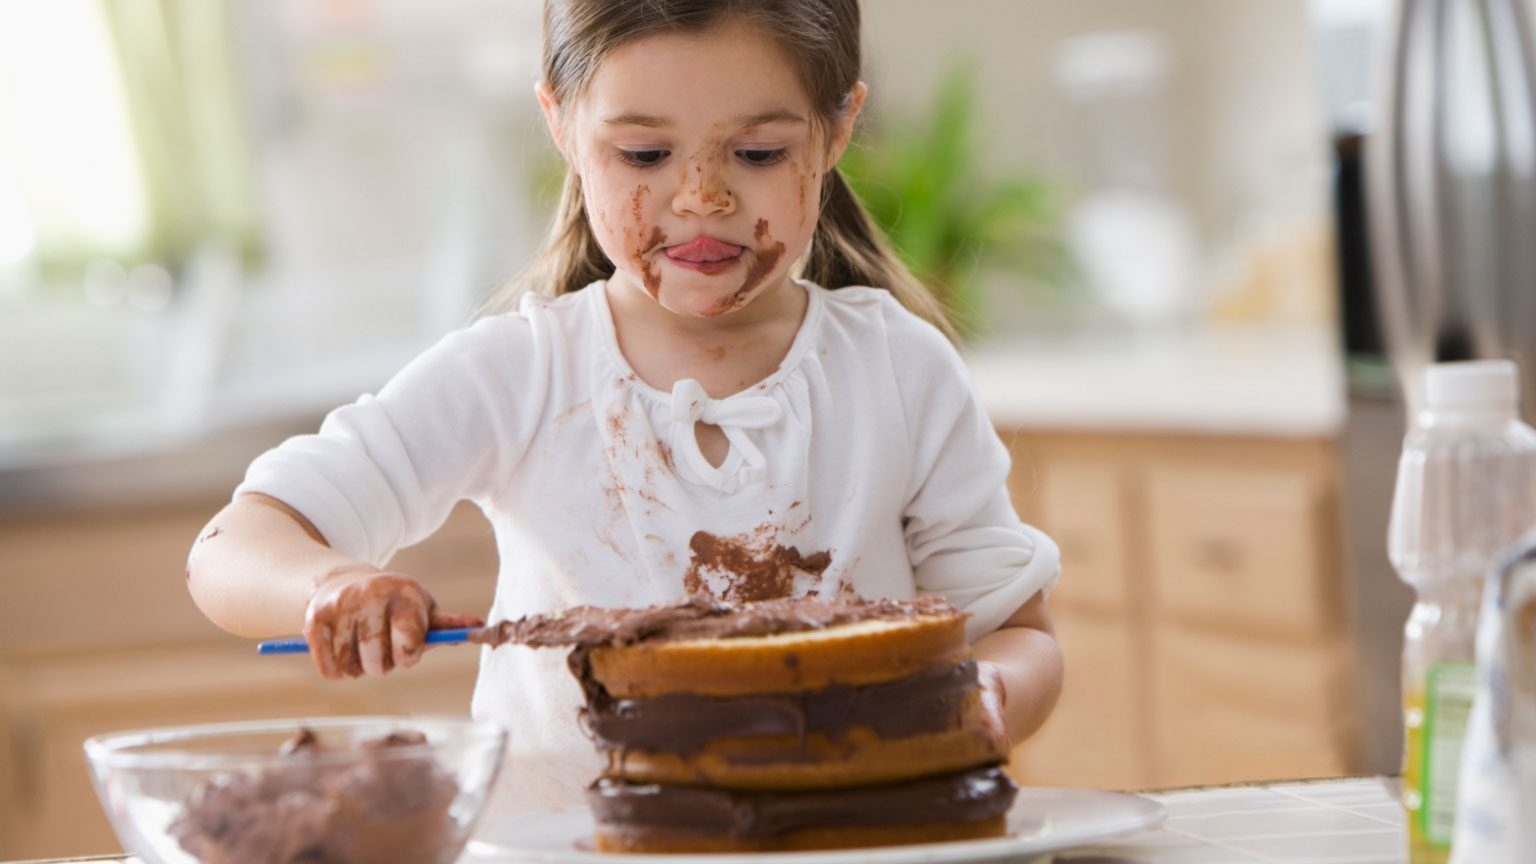 girl frosting cake